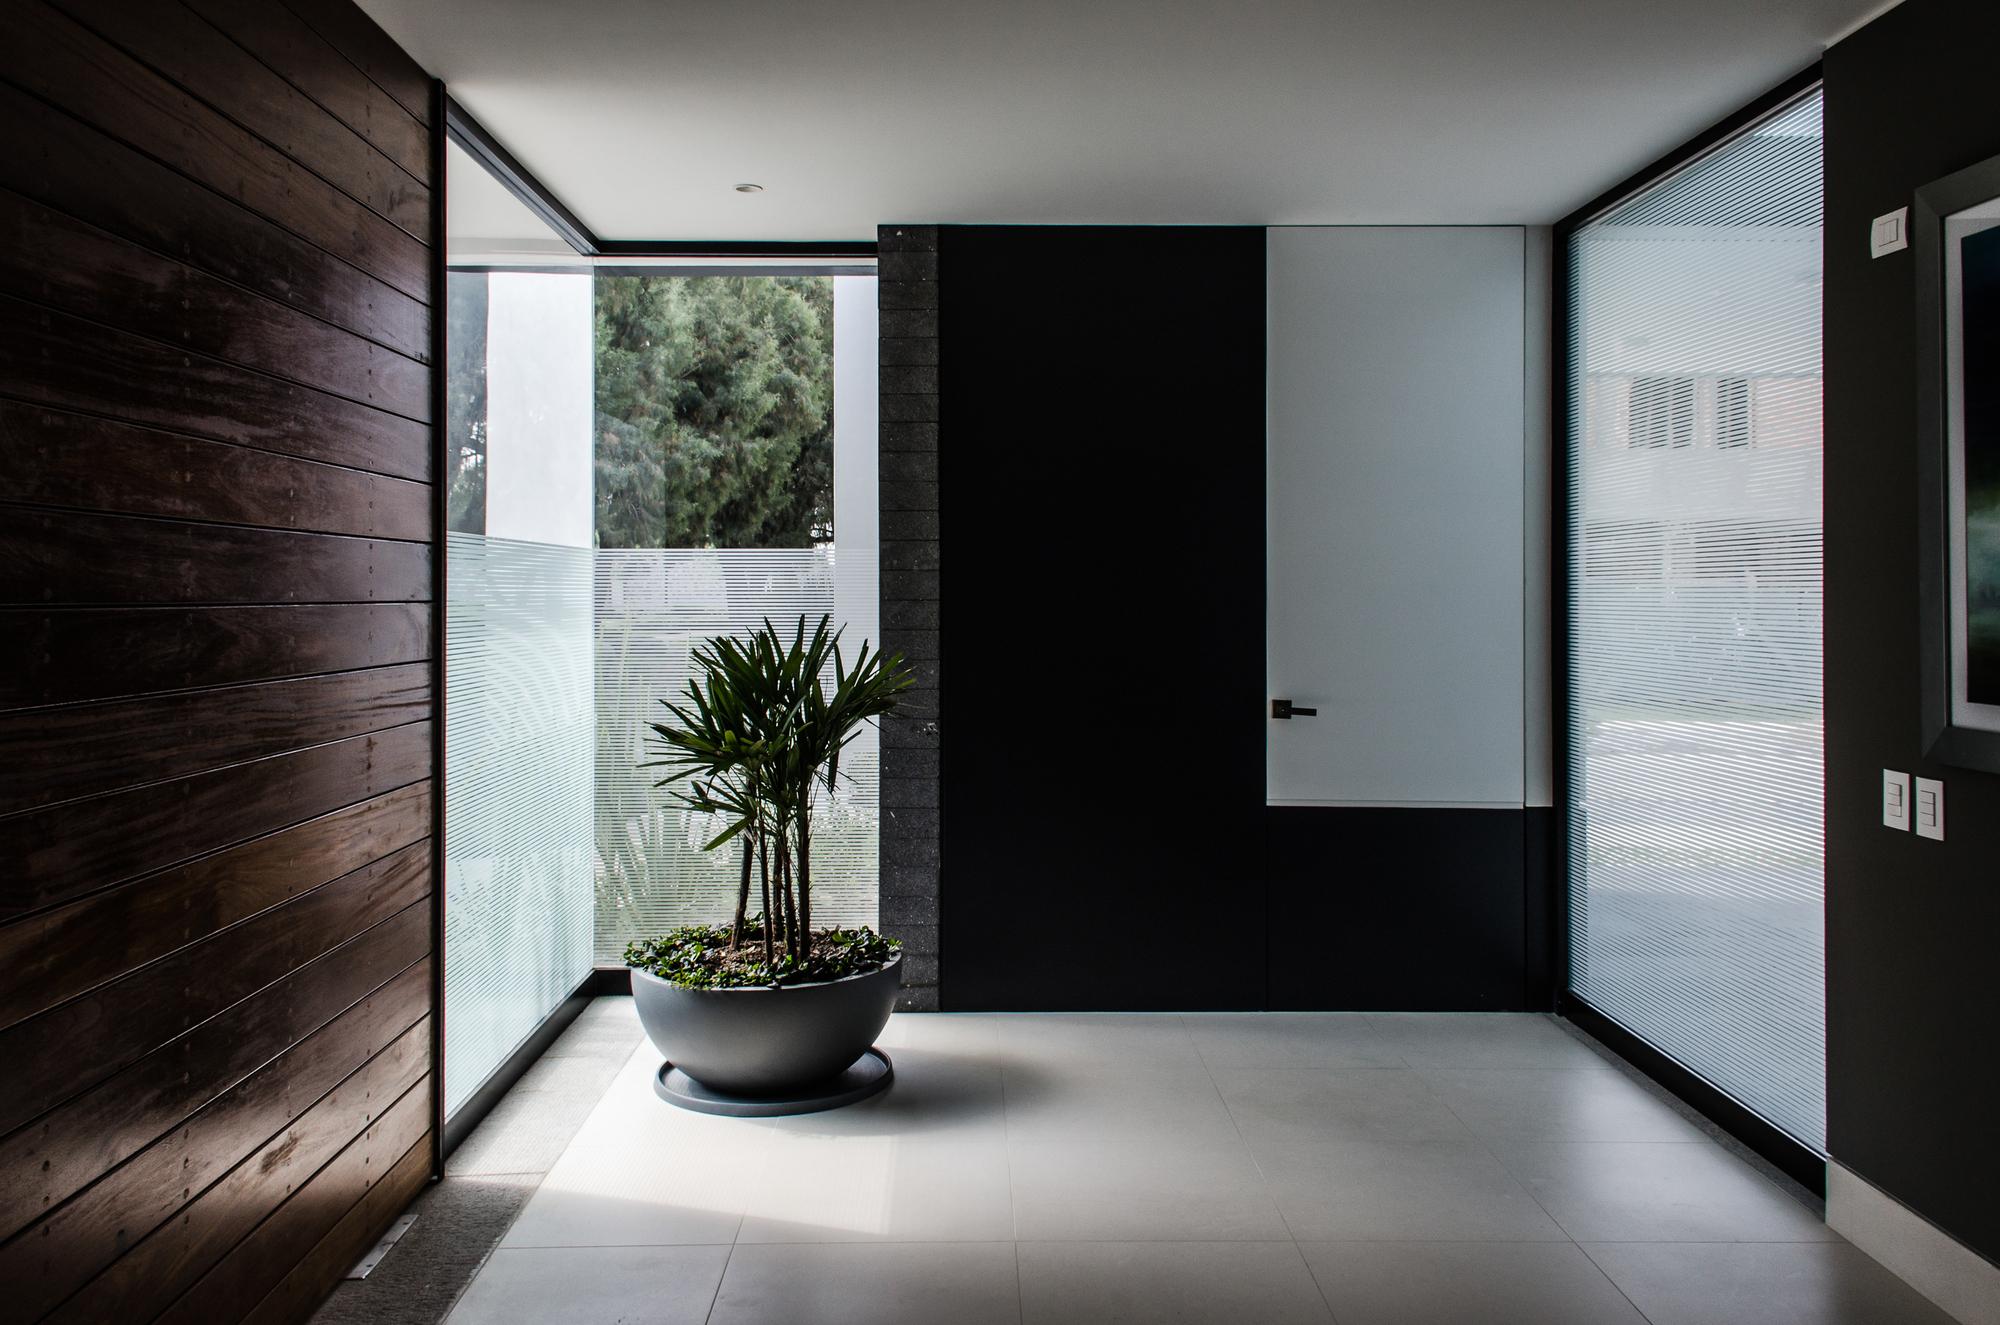 Galer a de casa agr adi arquitectura y dise o interior 8 for Arquitectura y diseno interior